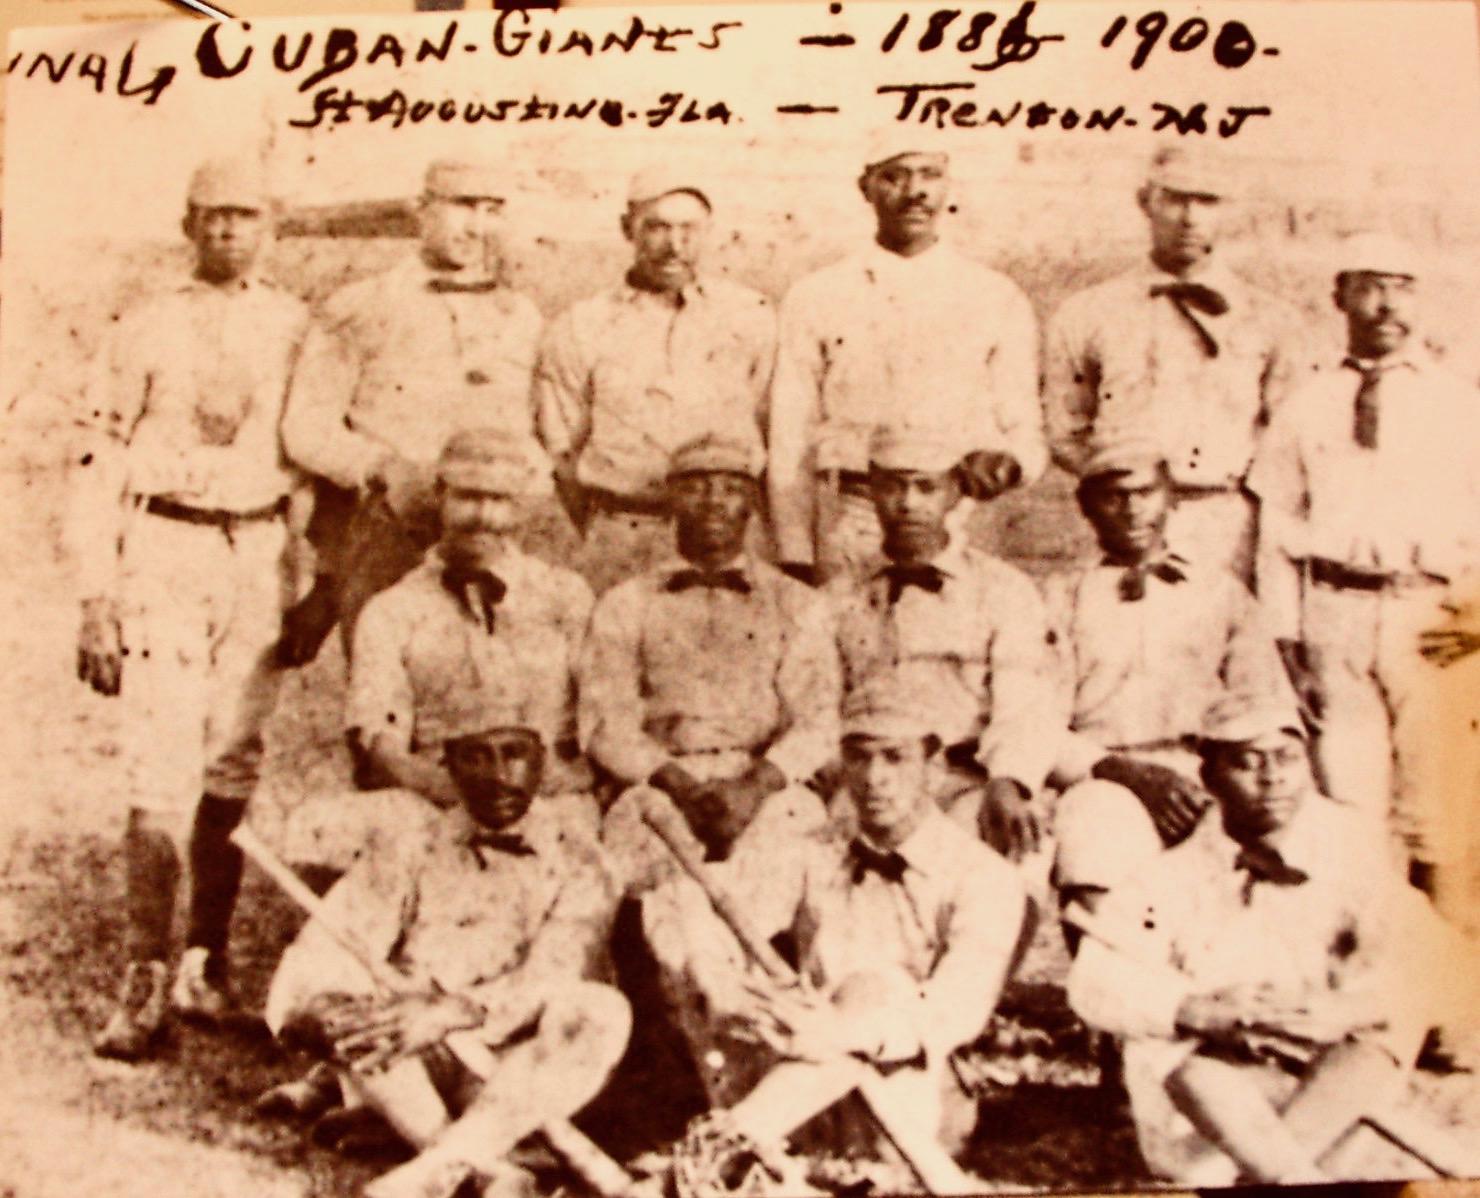 349-CUBAN GIANTS (1886-190O) TRENTON, NEW JERSEY (c. LAWRENCE E. WALKER FOUNDATION) 2